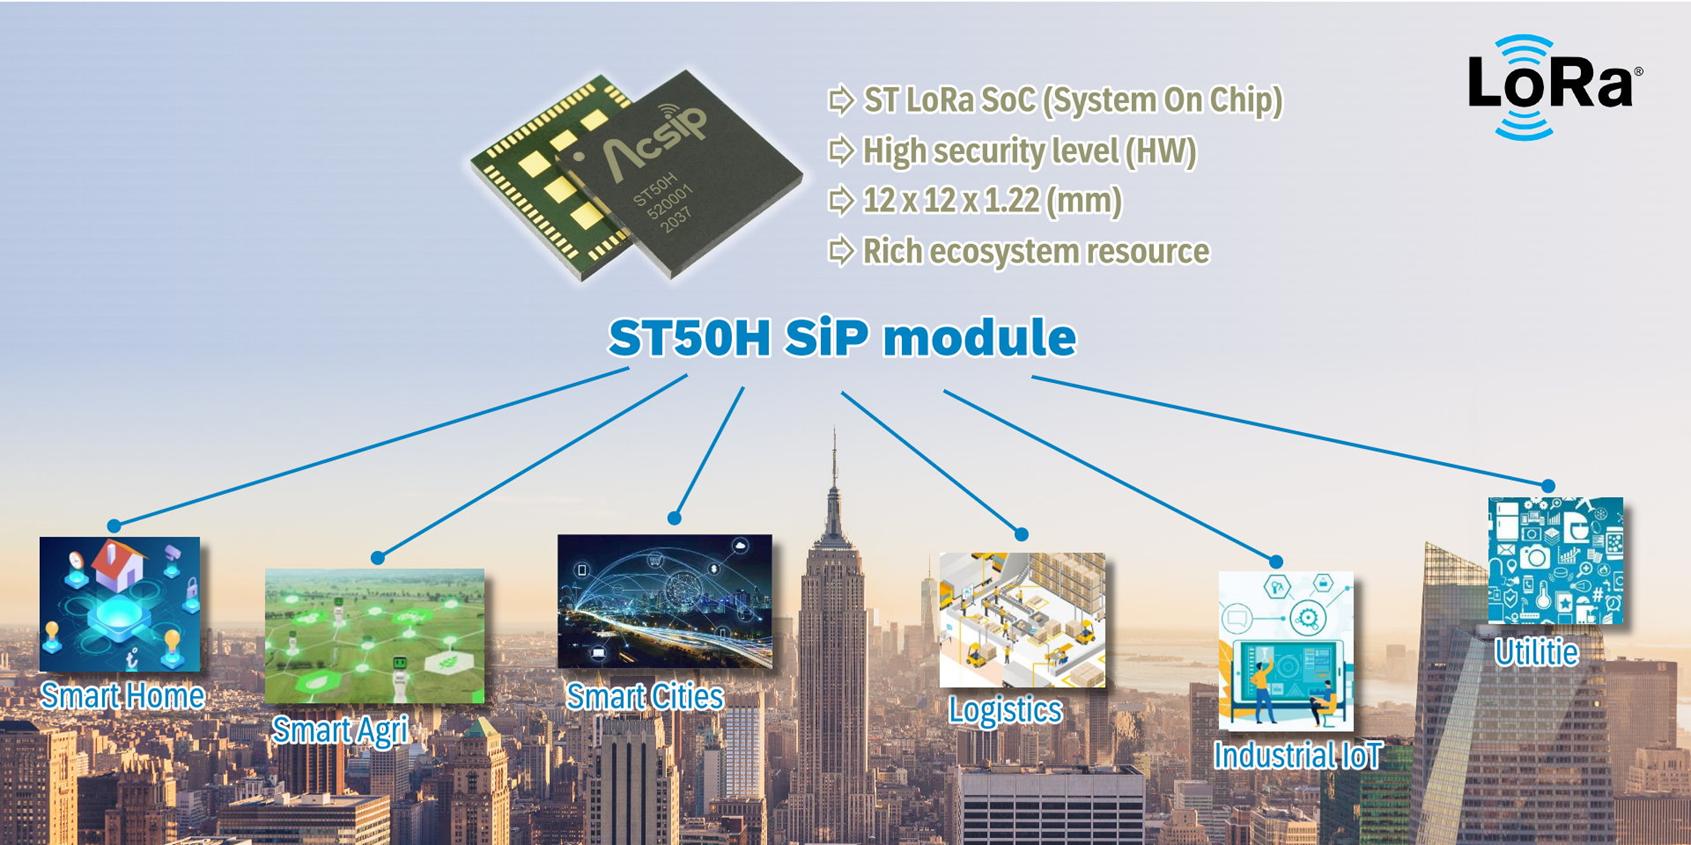 Neues LoRa-SiP-Modul ST50H